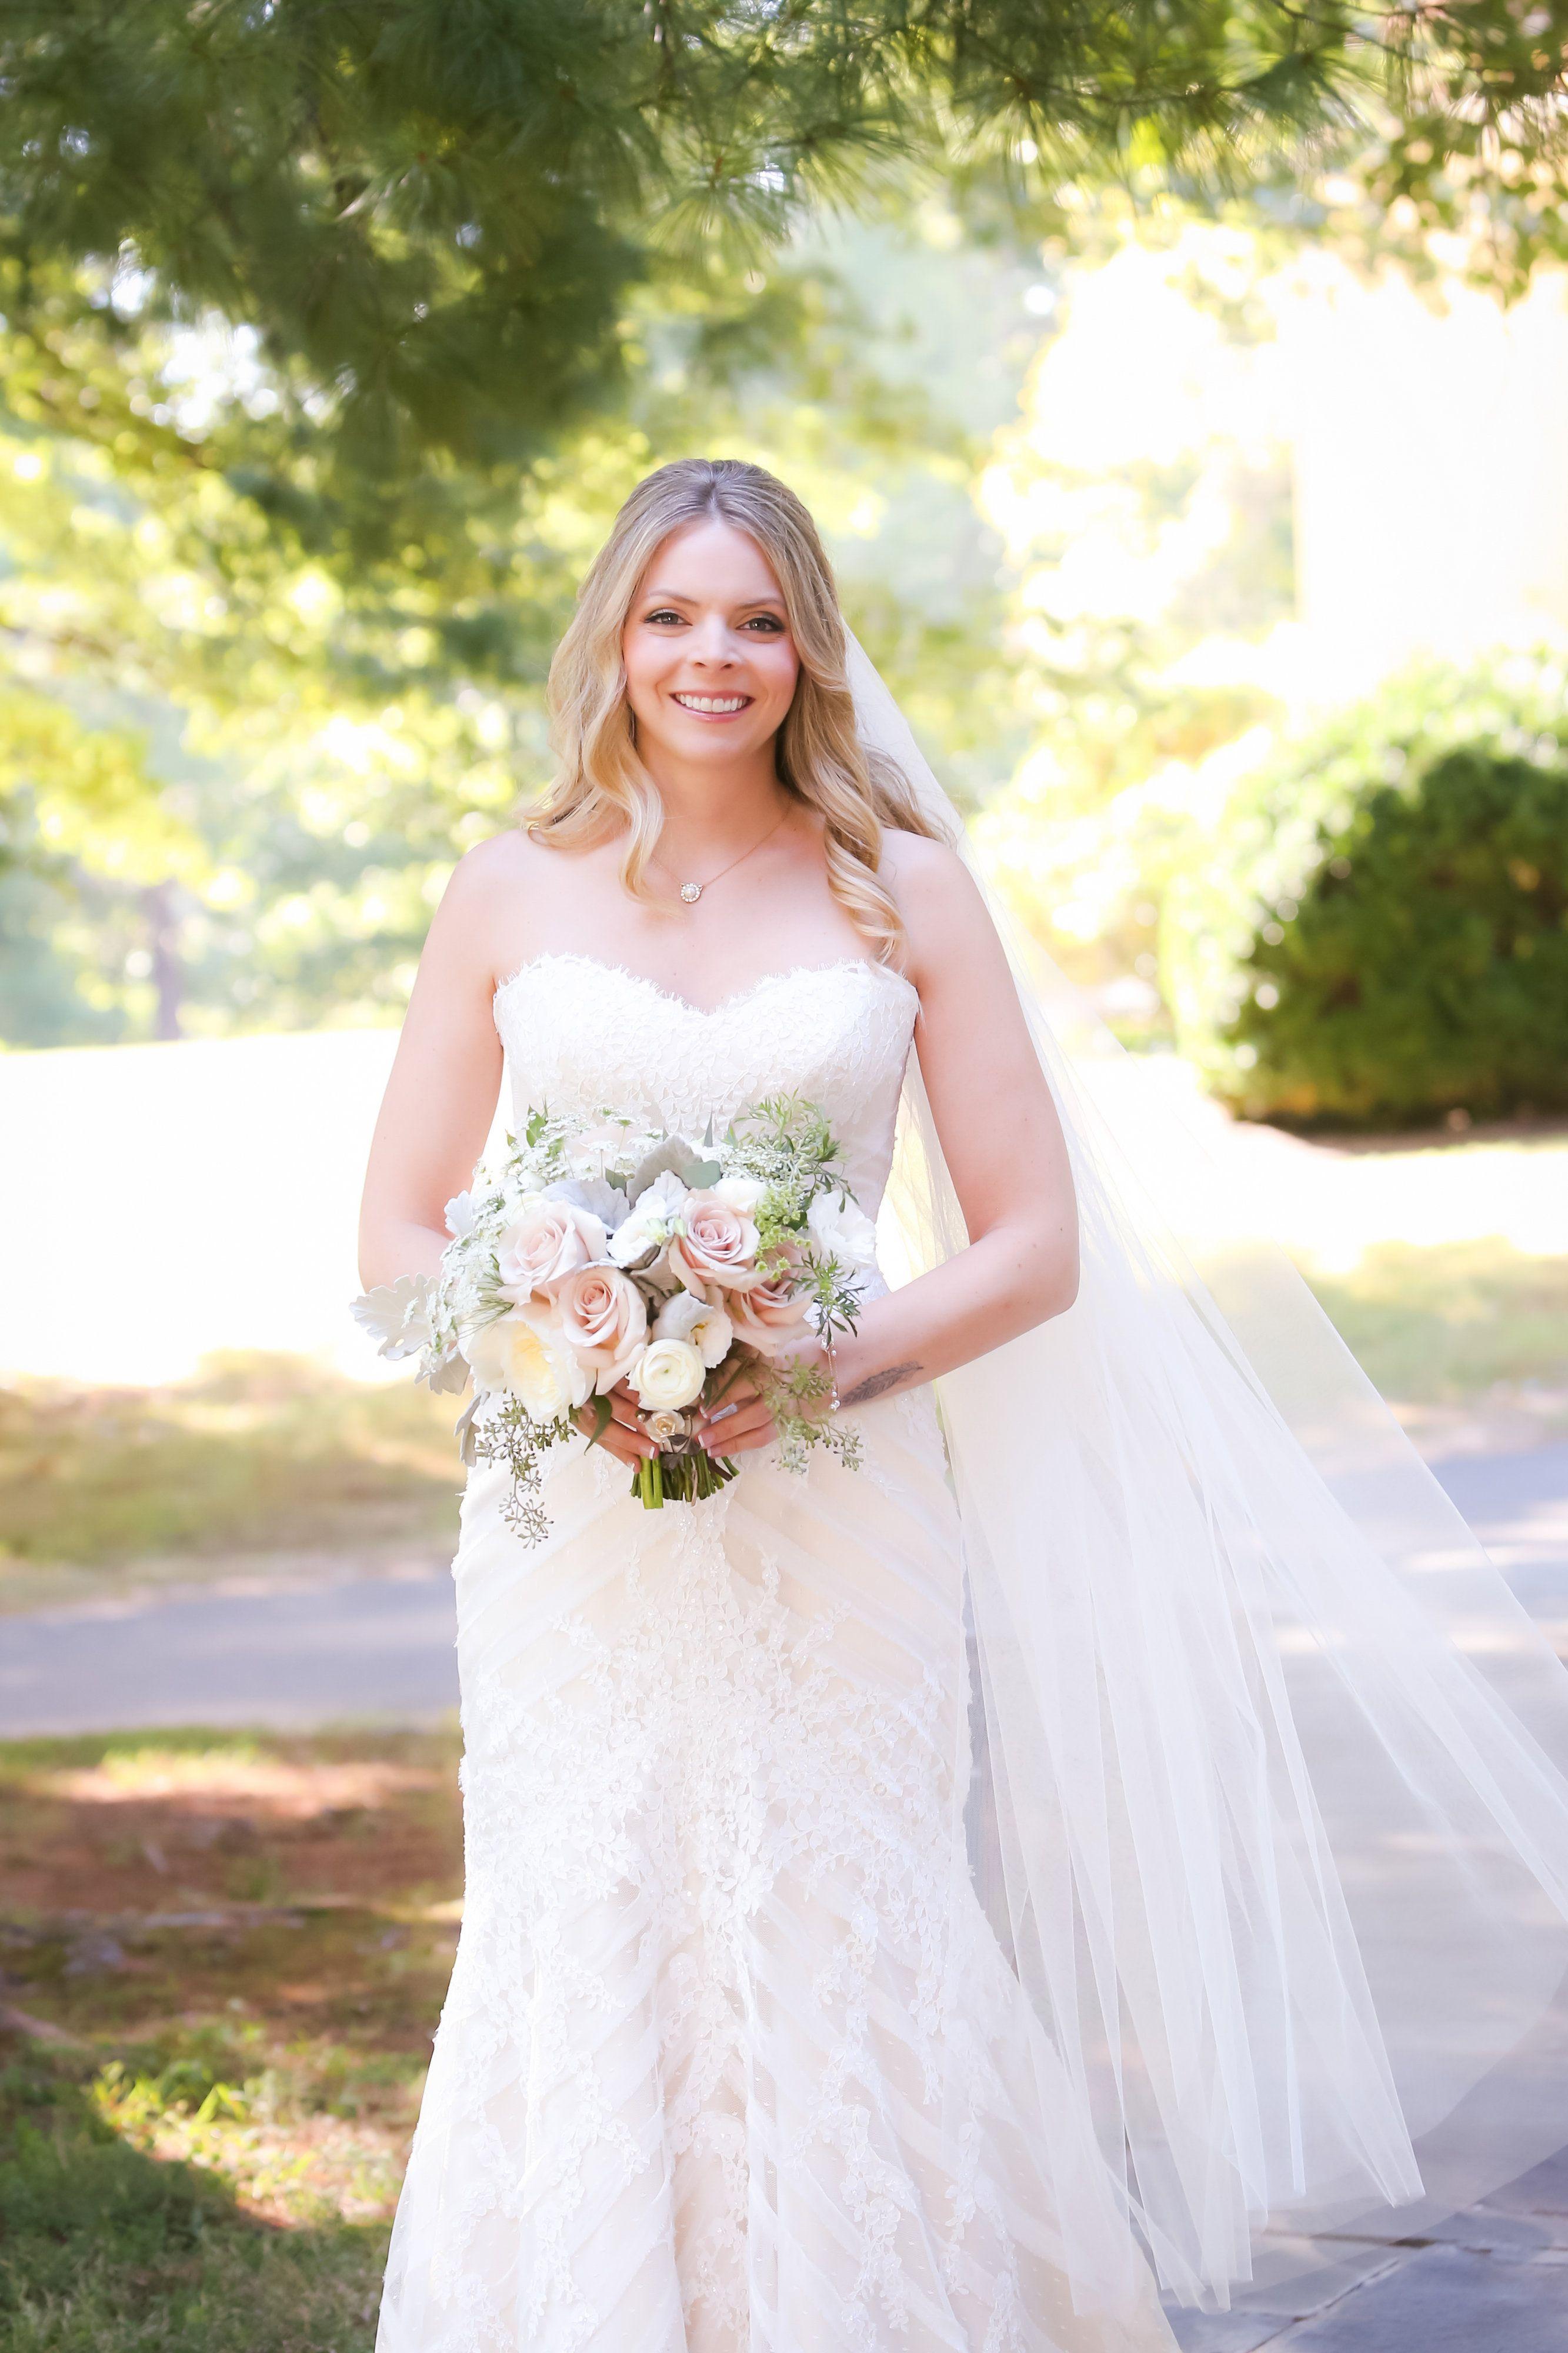 Bridal portrait late summer wedding photo credit kristine pringle